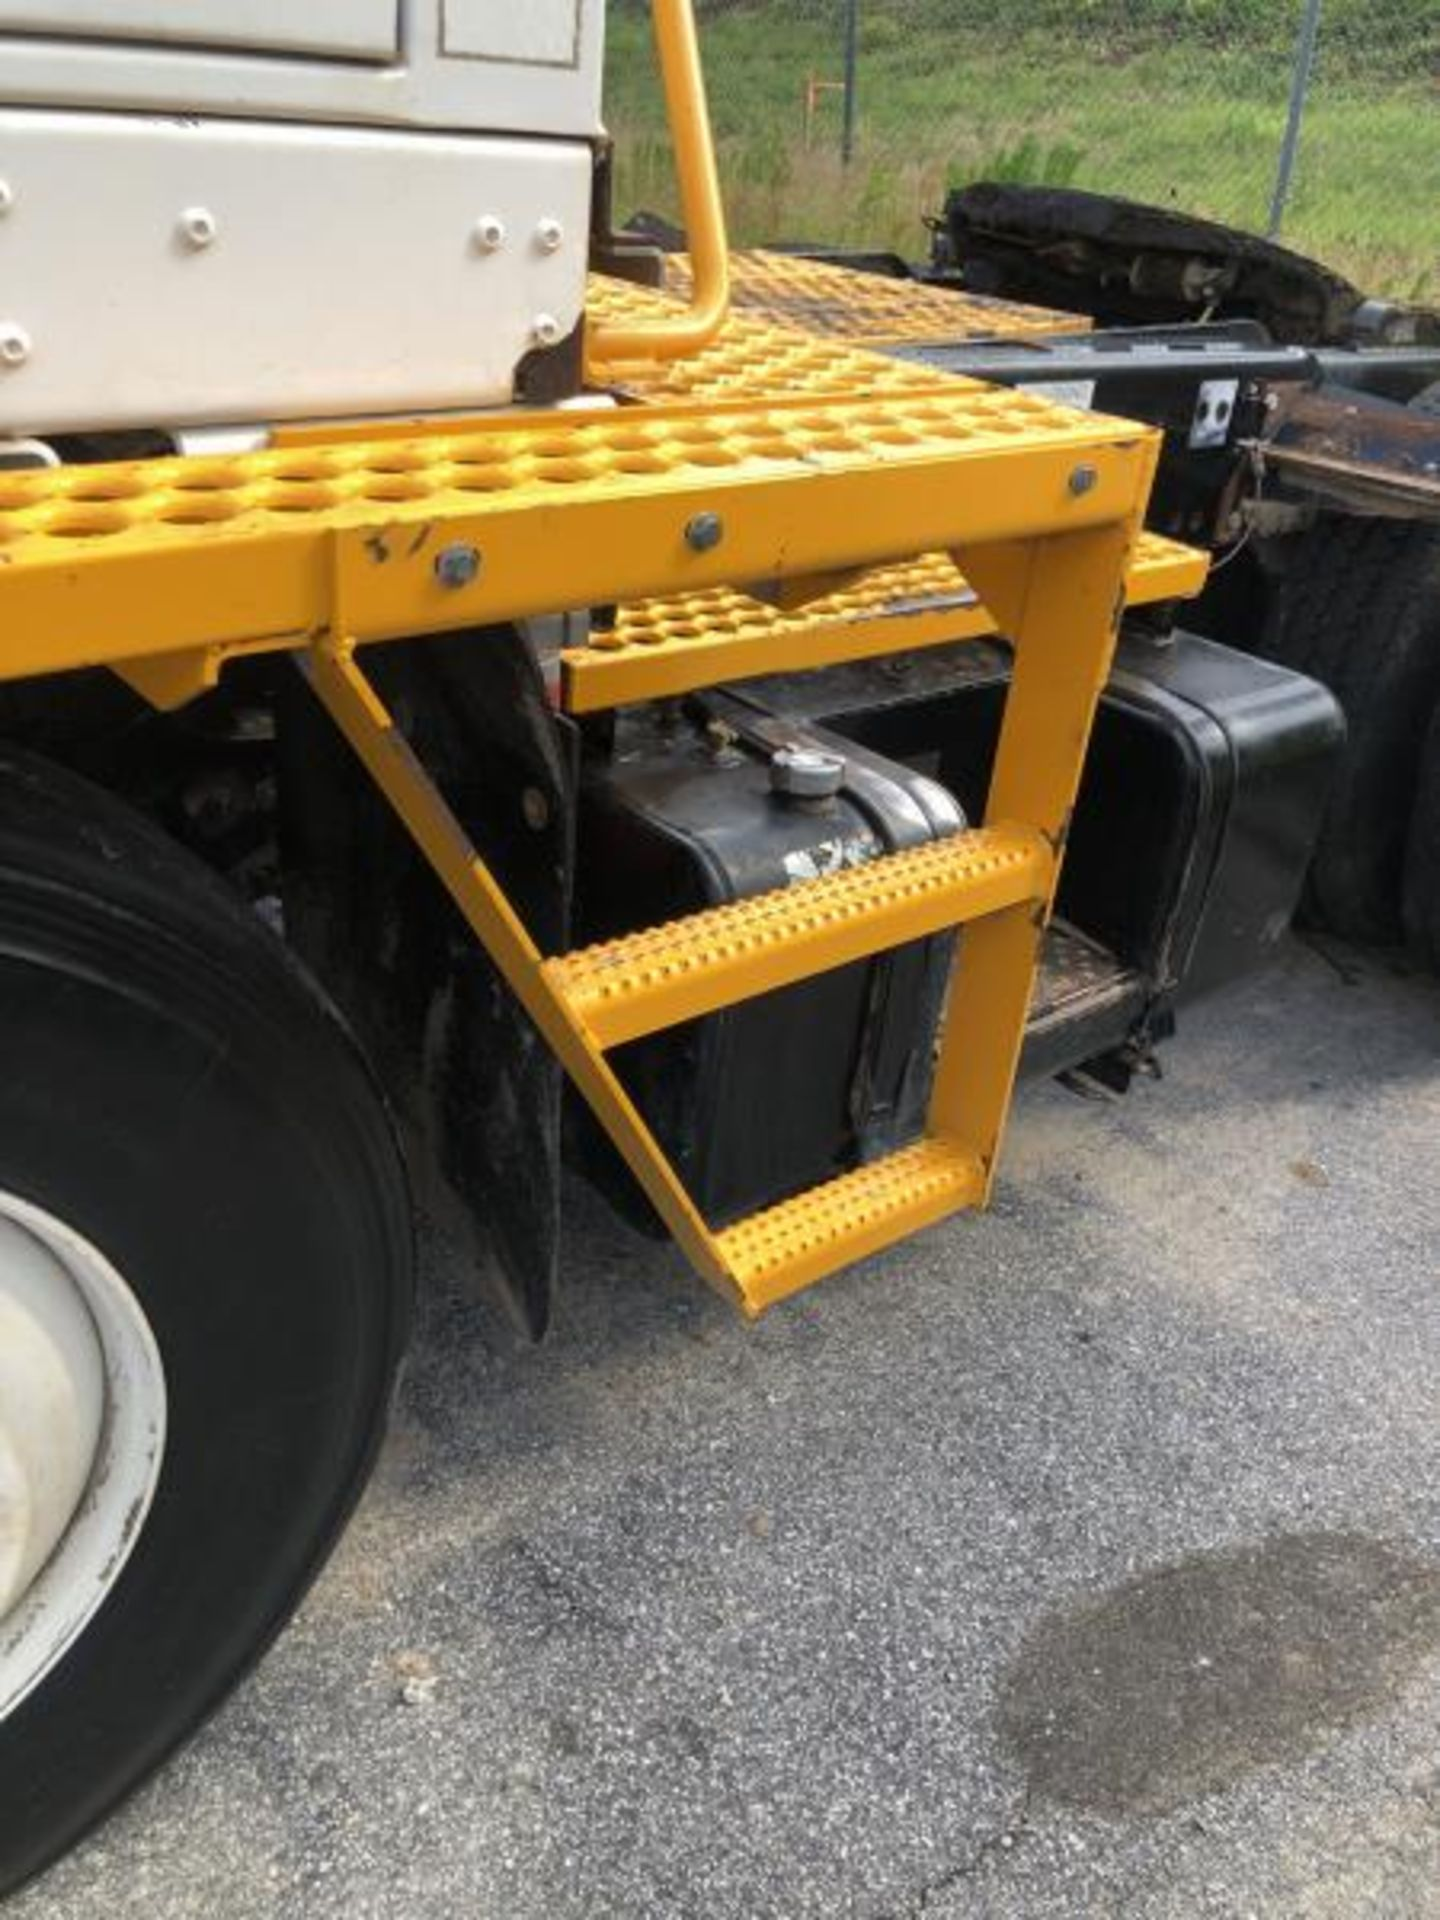 2015 Kalmar Ottawa 4x2 Yard Truck , SN: 338841 4,267.2 Hours, 1,683 Miles - Image 7 of 34